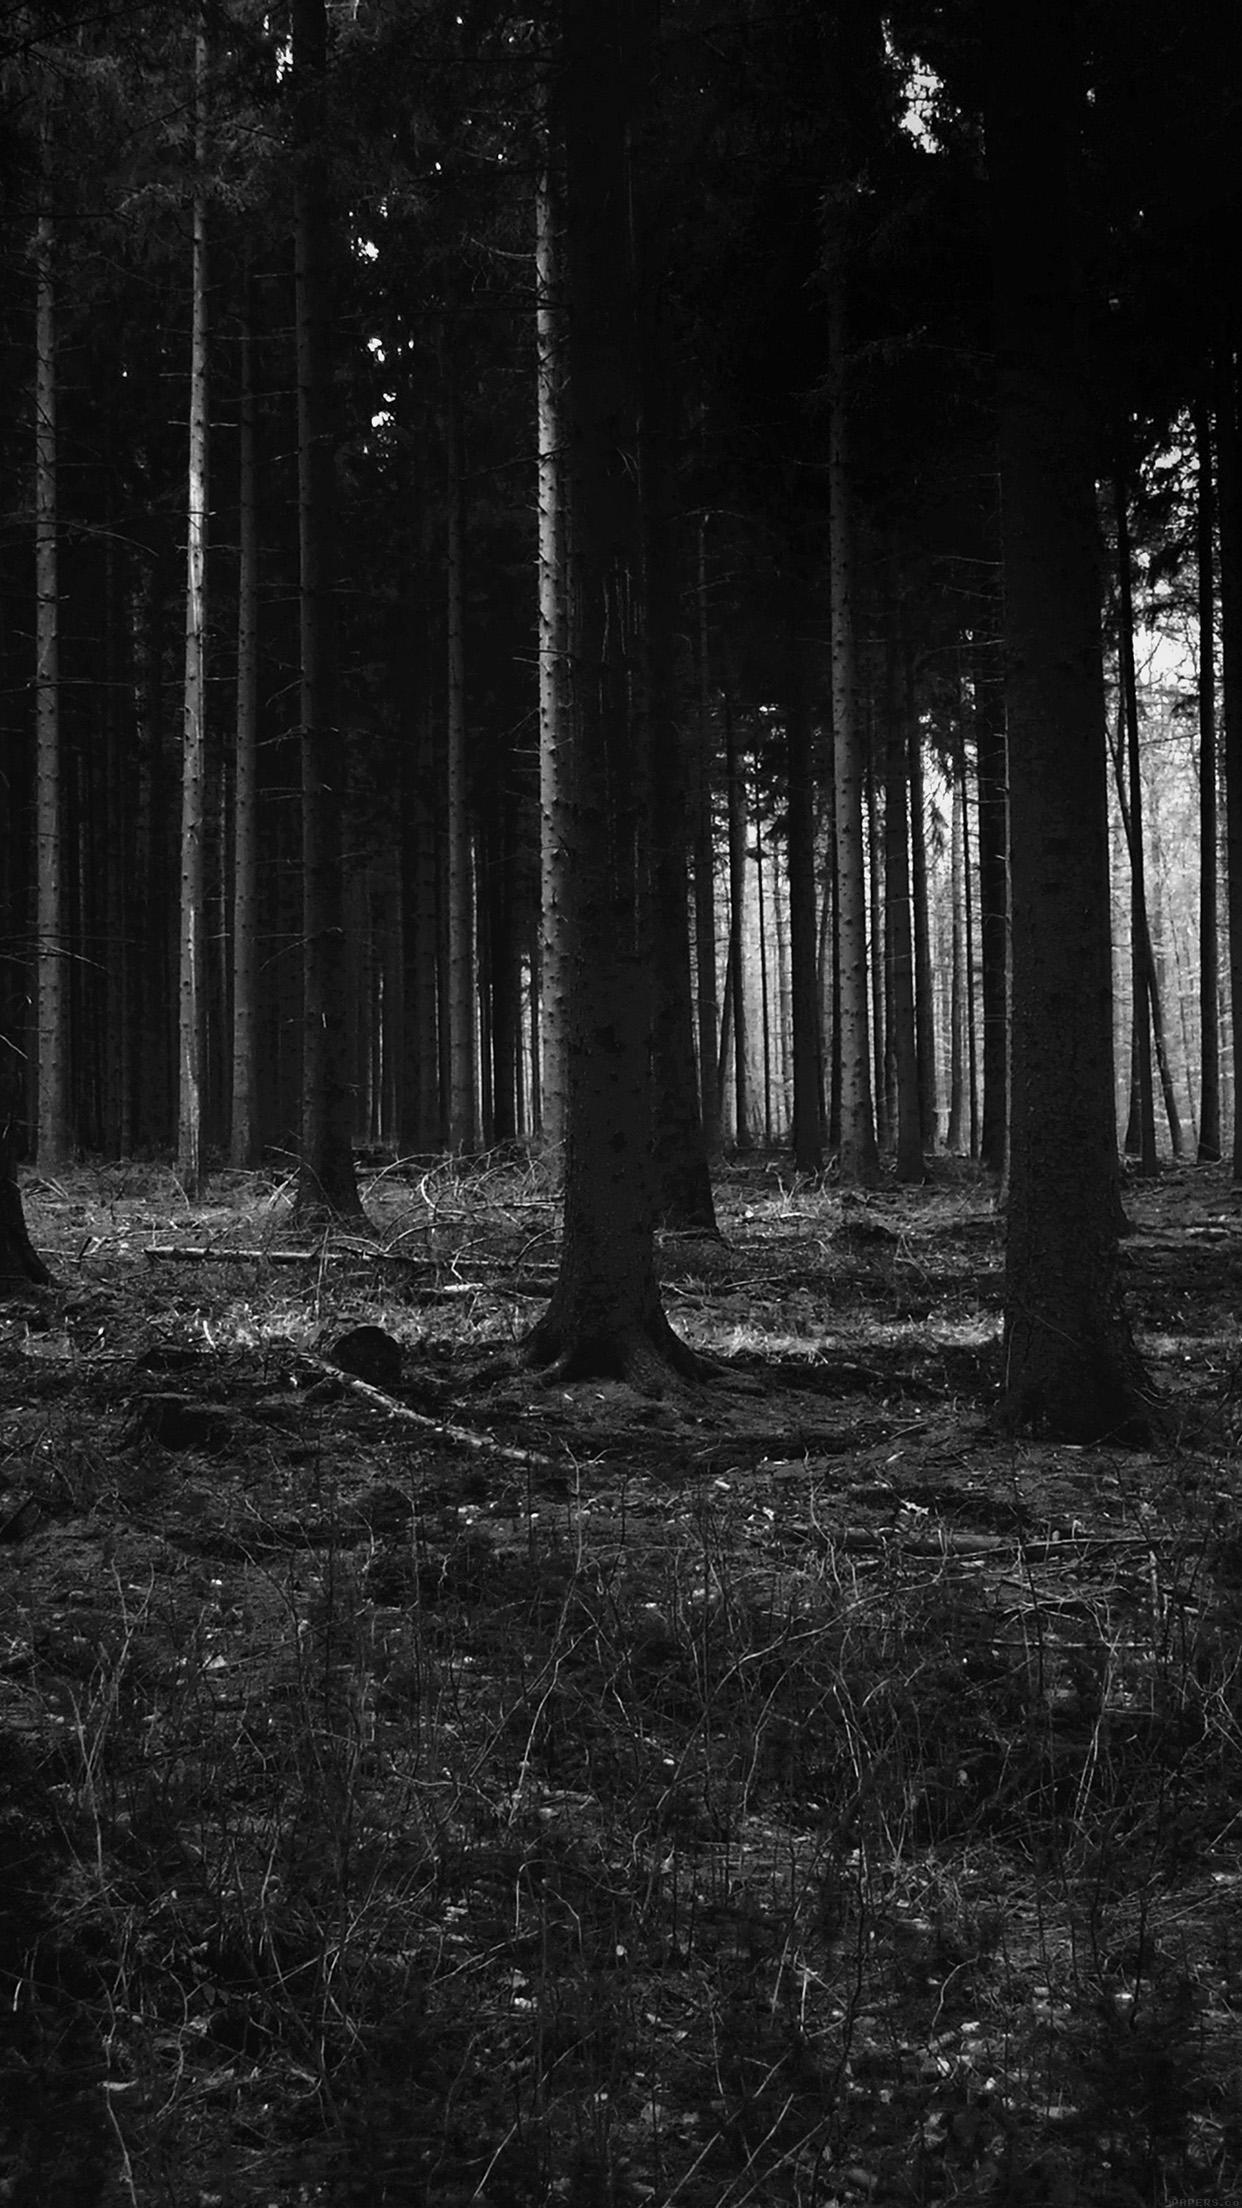 86_dark_forest.jpg (1132×800) | Creepy Forest | Pinterest .